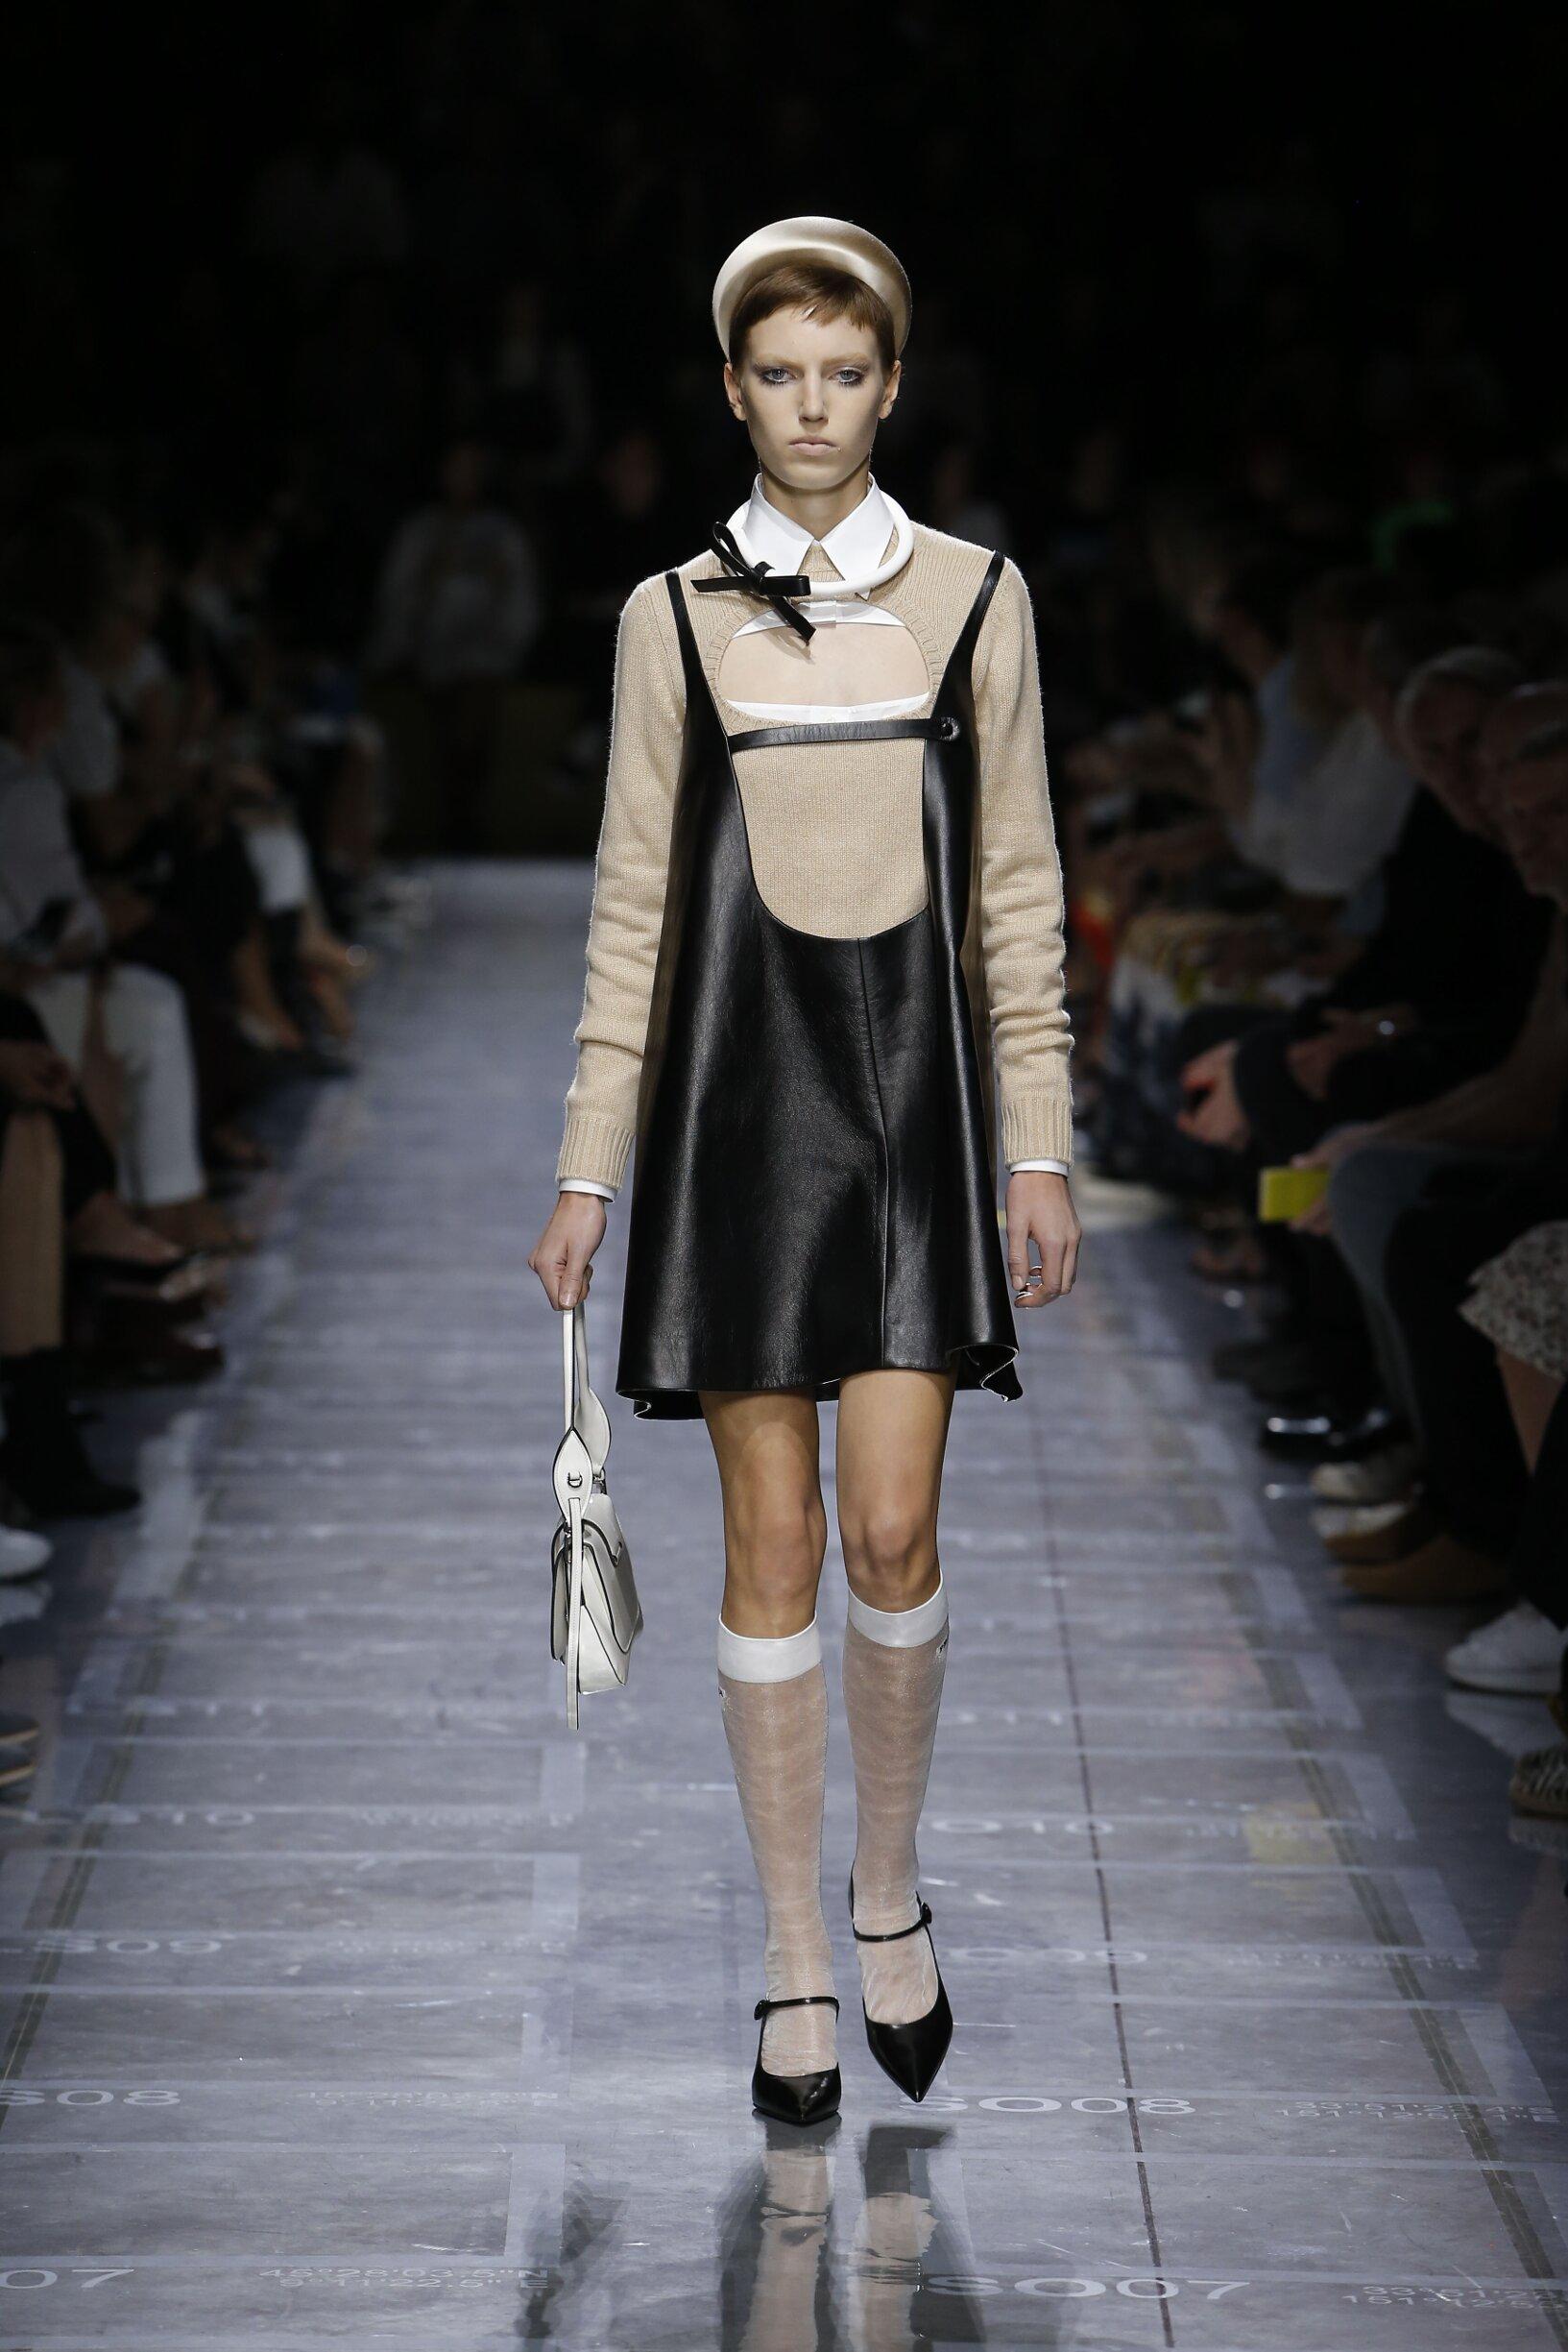 Spring 2019 Womenswear Prada